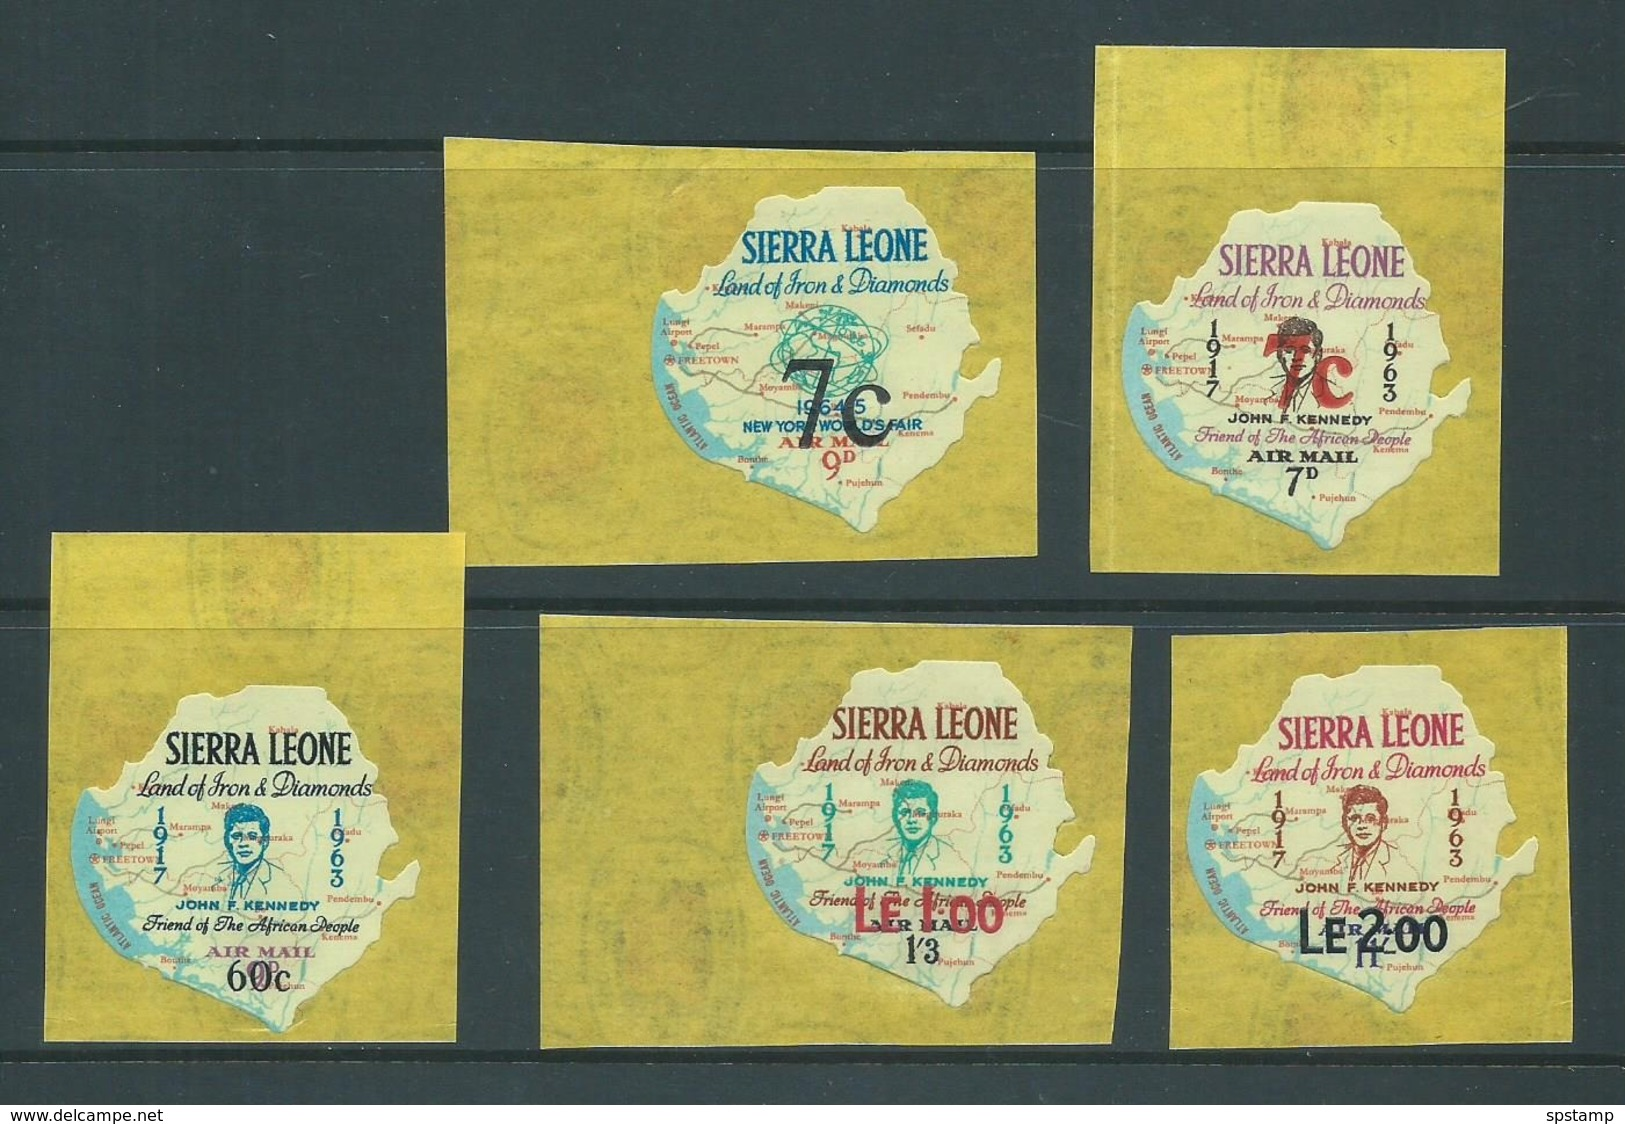 Sierra Leone 1964 - 1965 Air Mail Surcharges On Self Adhesives Set 5 Fresh MLH - Sierra Leone (1961-...)